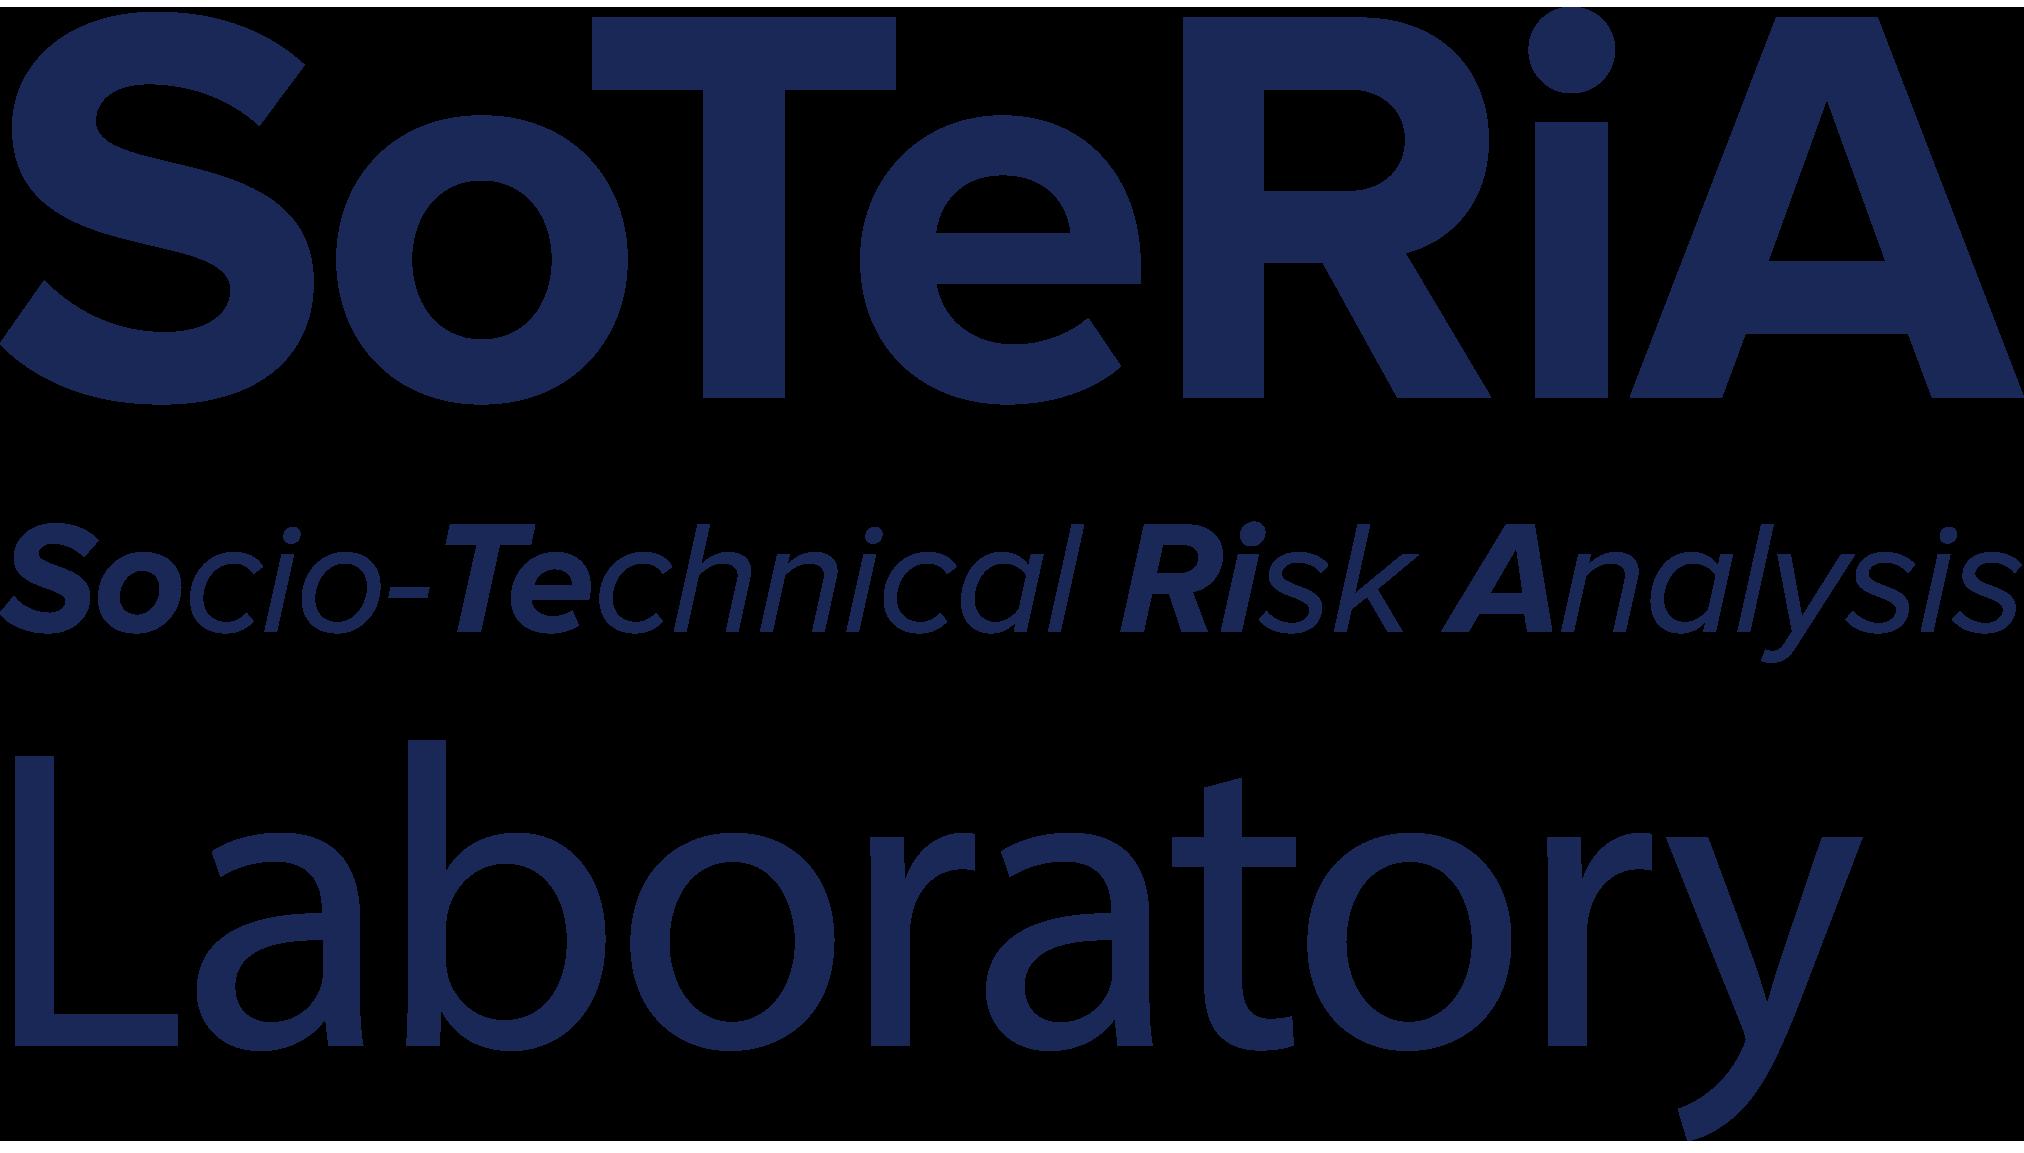 soteria lab logo